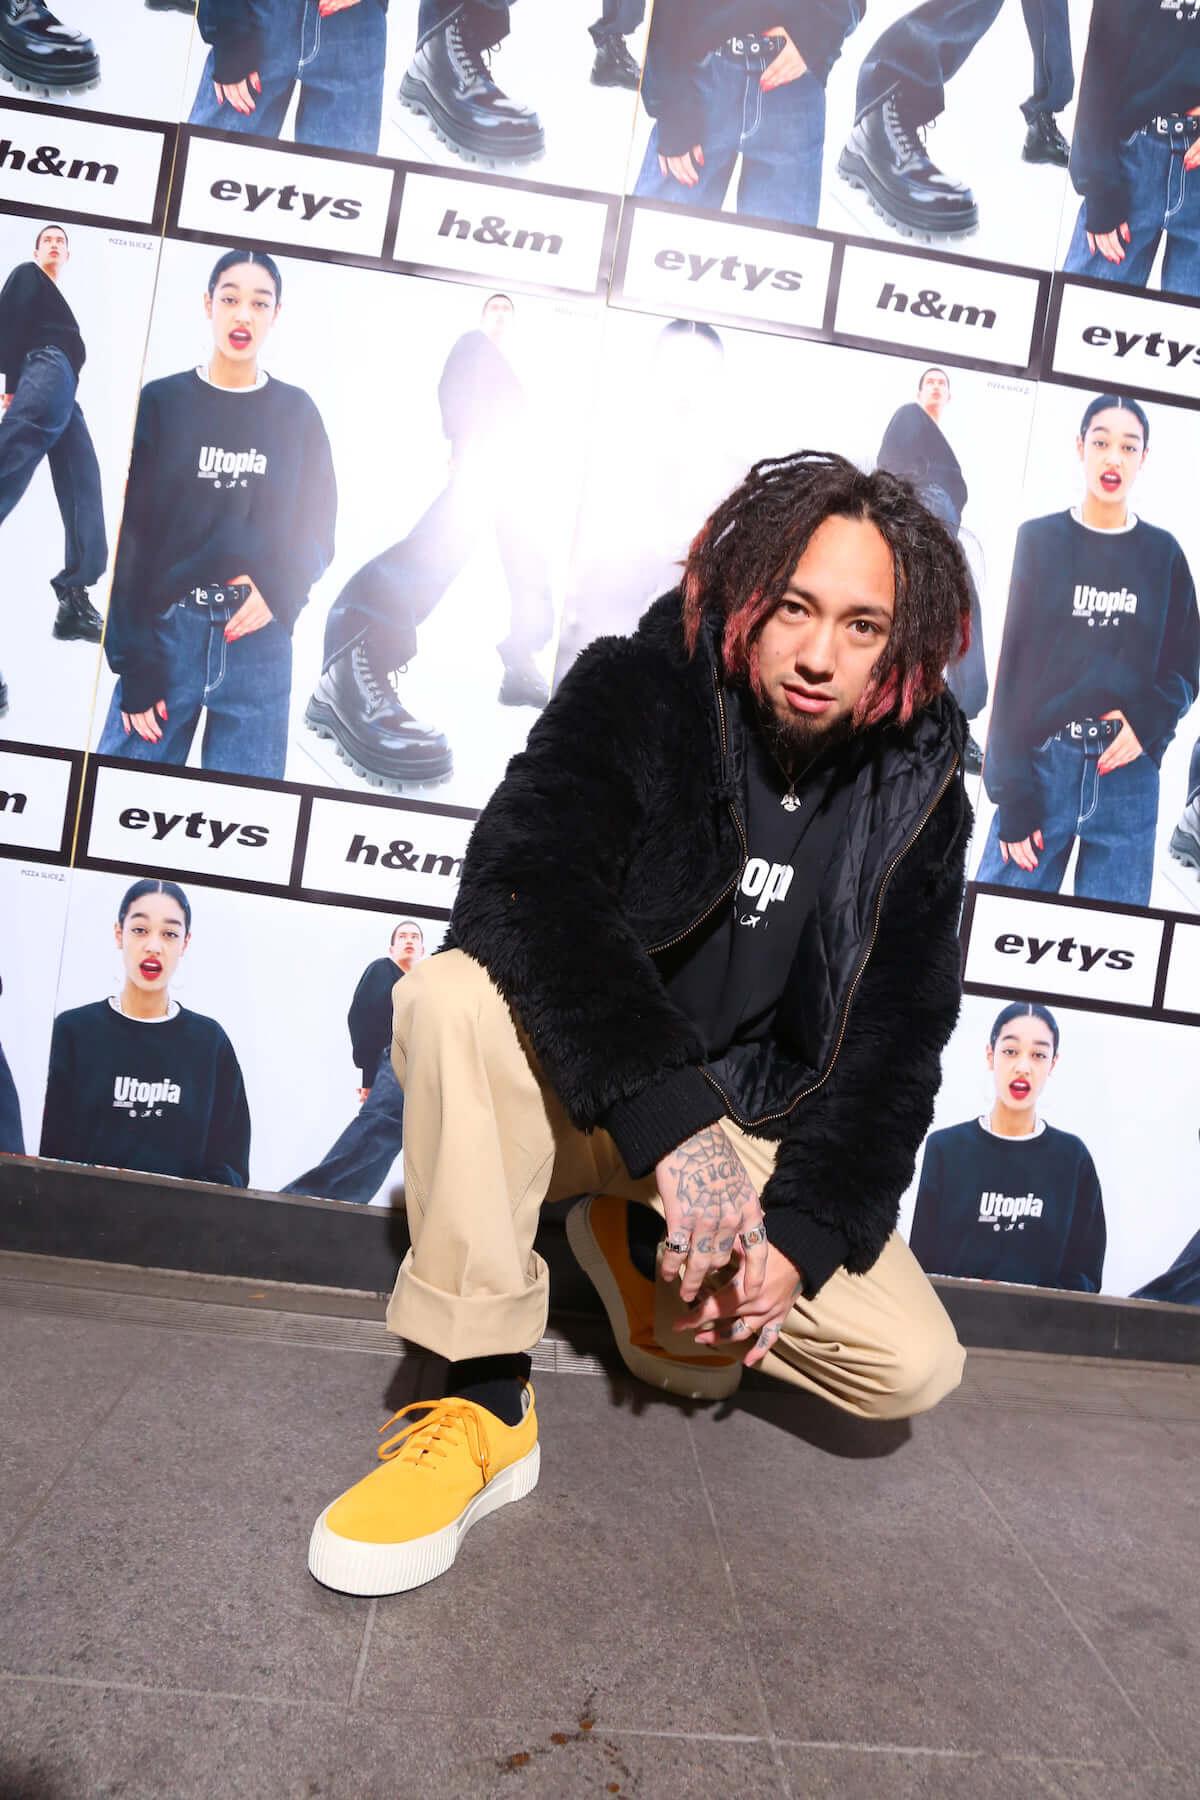 Eytys×H&Mのコラボコレクションが本日より発売開始 life-fashion190124-hm-eytys-1-1200x1800